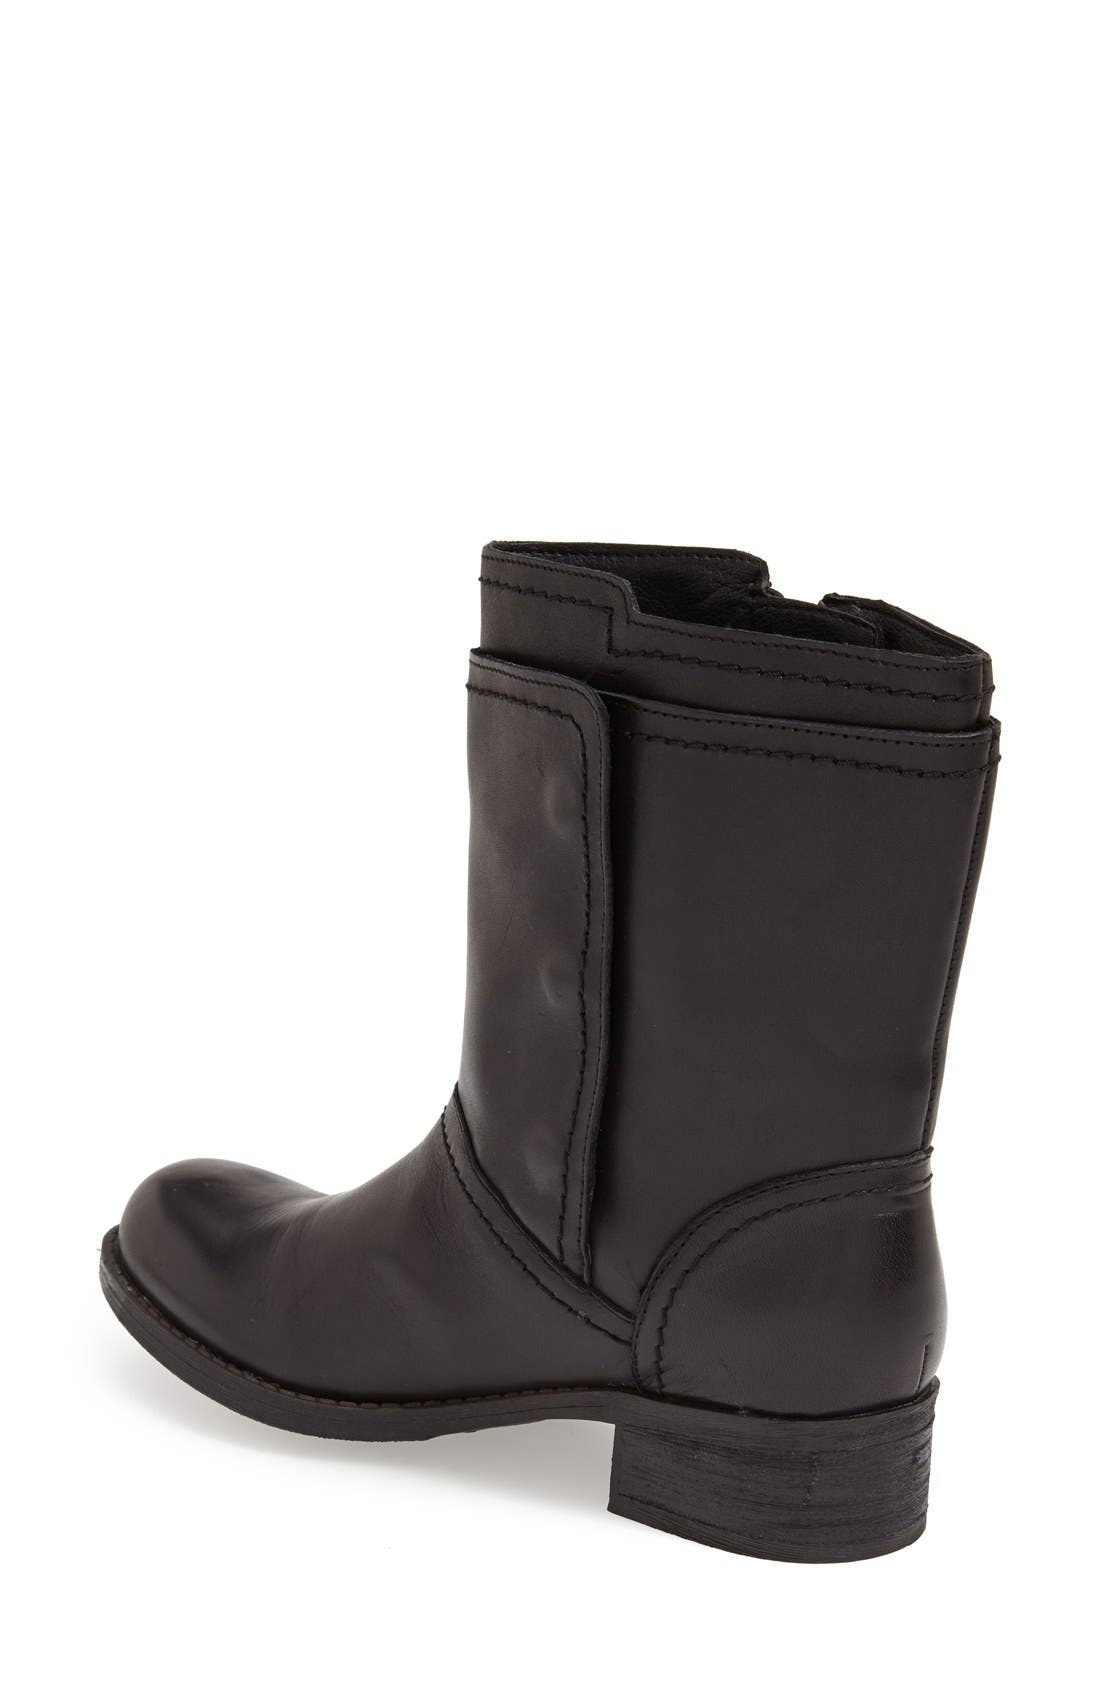 Alternate Image 2  - BCBGeneration 'Everest' Leather Boot (Women)